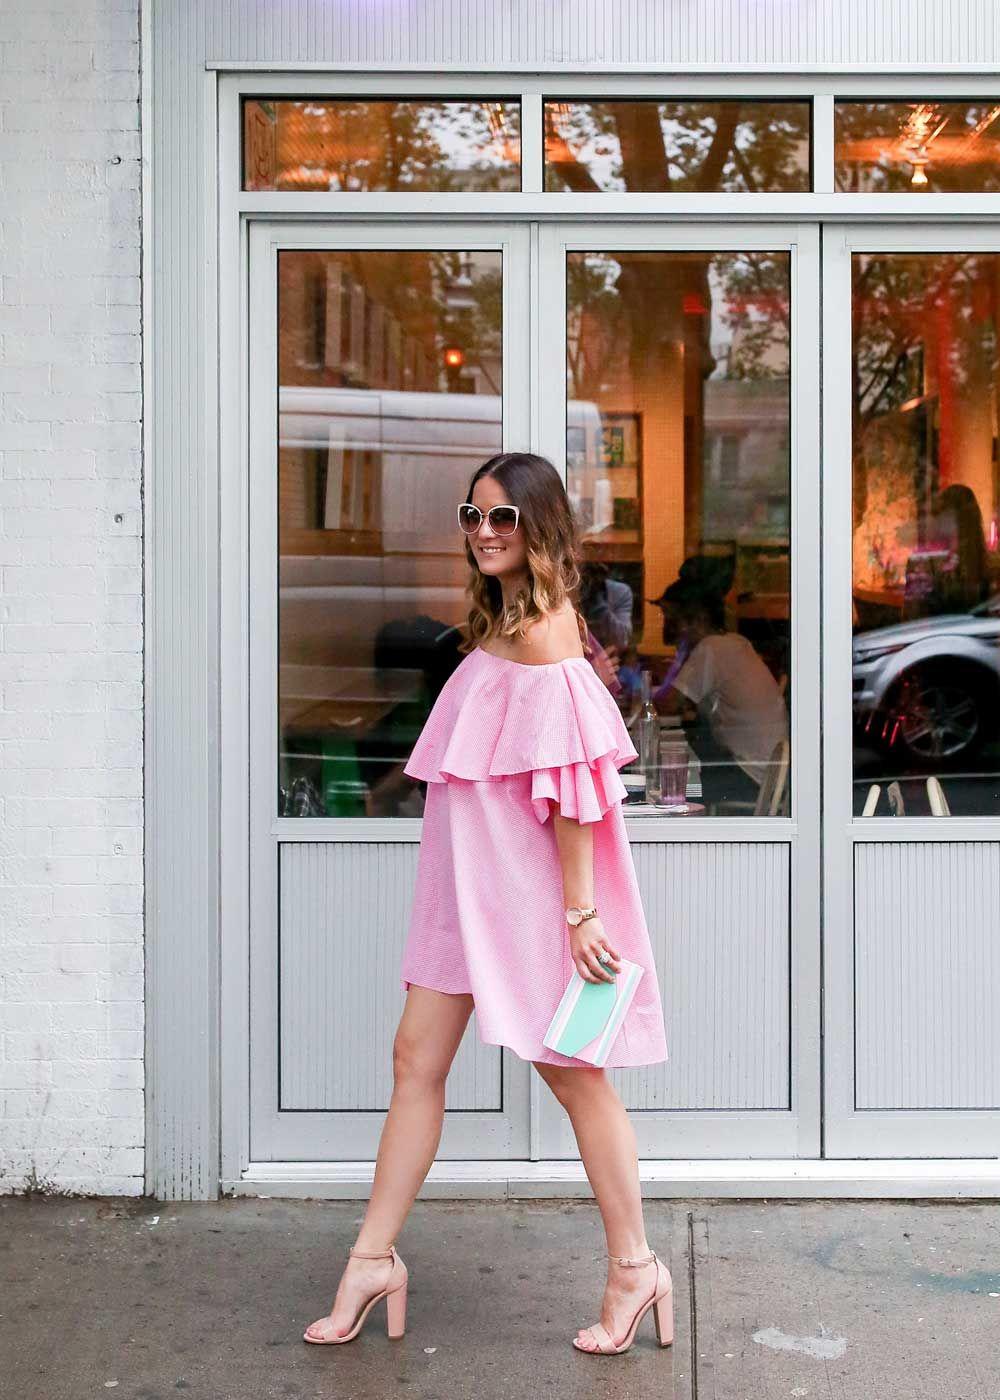 Pink Off Shoulder Dress Style Charade Off Shoulder Dress Off Shoulder Outfits Off Shoulder Evening Dress [ 1400 x 1000 Pixel ]